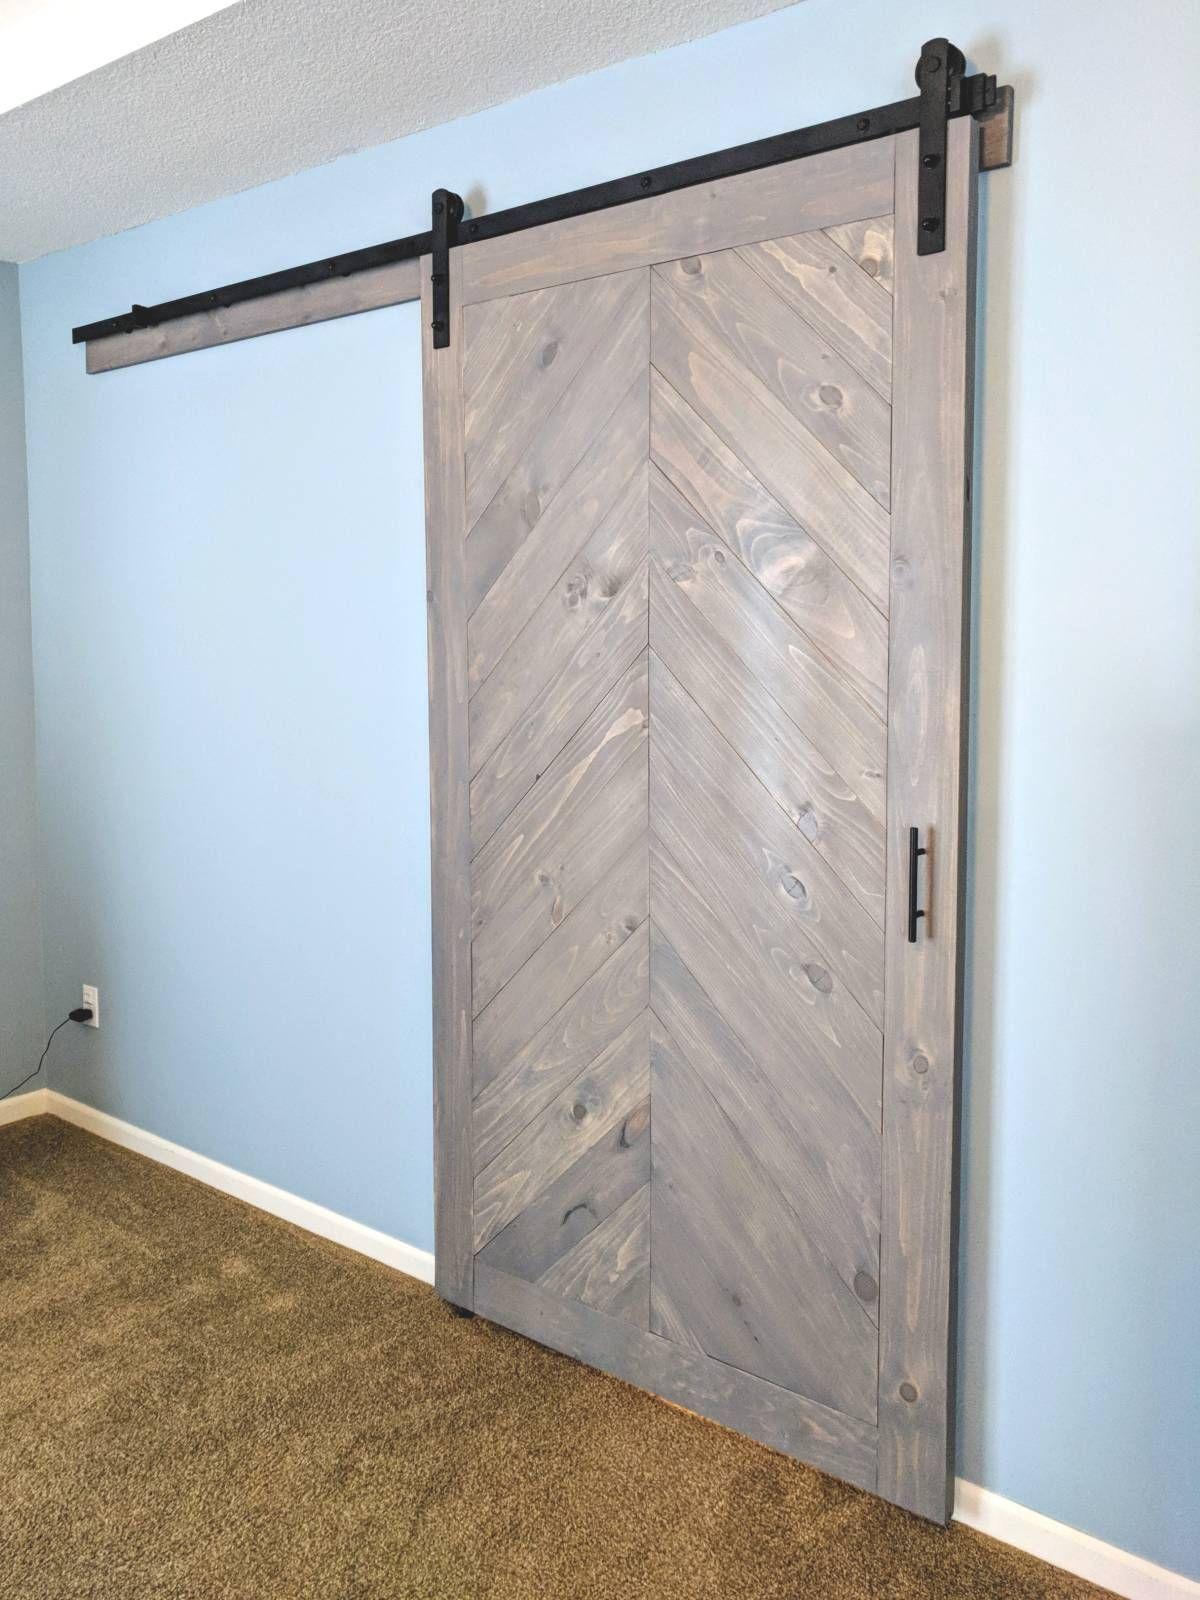 Chevron Barn Door Walston Door Company N Kansas City Mo Interior Barn Doors Barn Door Barn Doors Sliding